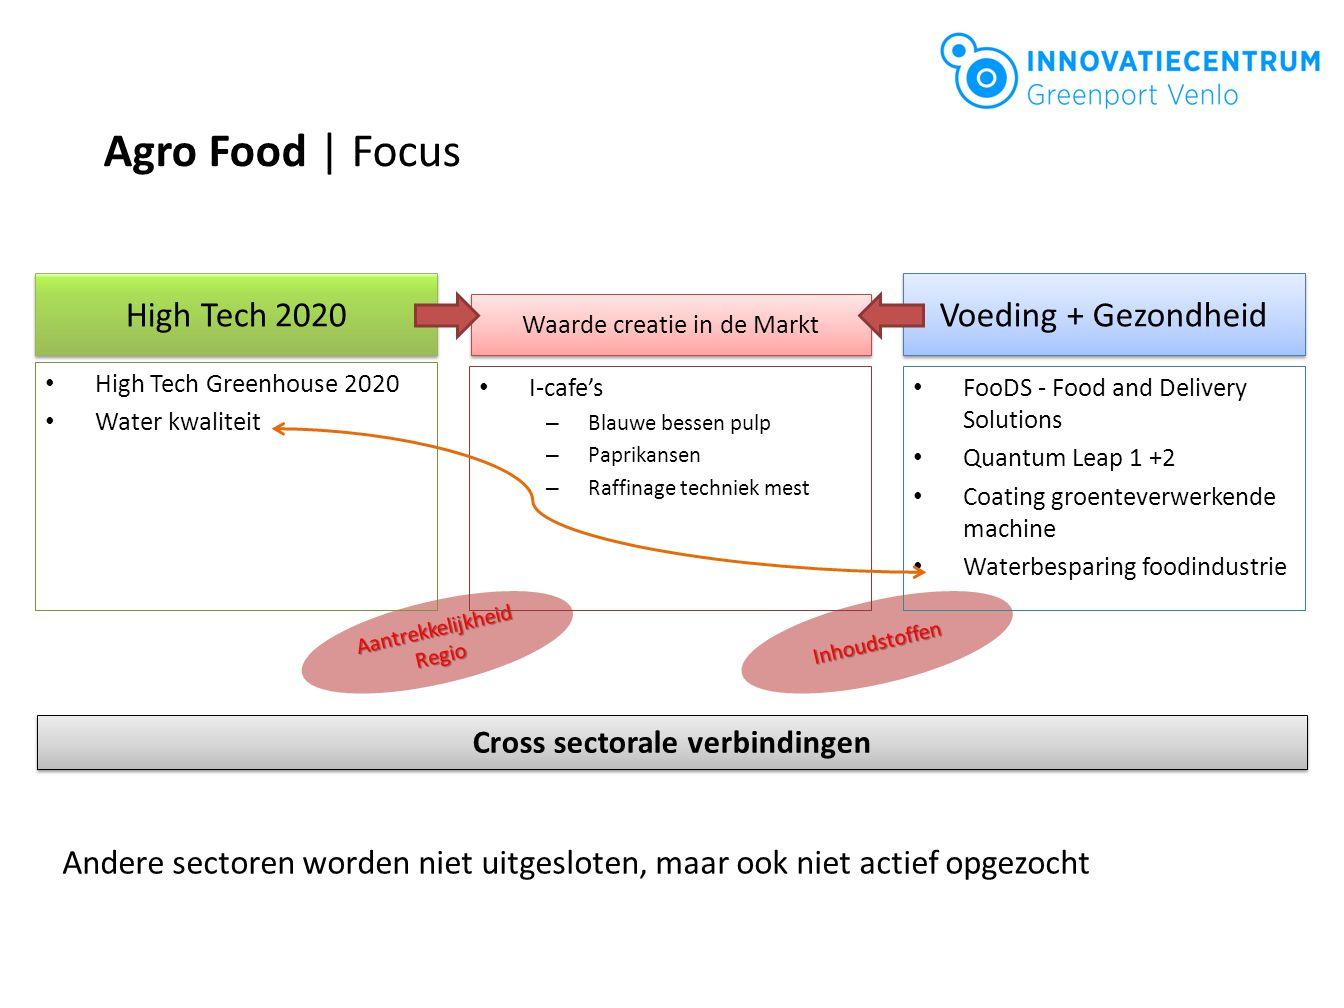 FOOD FUTURE netwerk FOOD FUTURE Deelregio´s en bevoegdheden NOM – Investerings- en ontwikkelings- maatschappij voor Noord-Nederland Oost NV – Ontwikkelingsmaatschappij Oost Nederland NV LIOF – NV Industriebank LIOF NieKE – Landesinitiative Ernährungswirtschaft FPI – Food-Processing Initiative e.V.